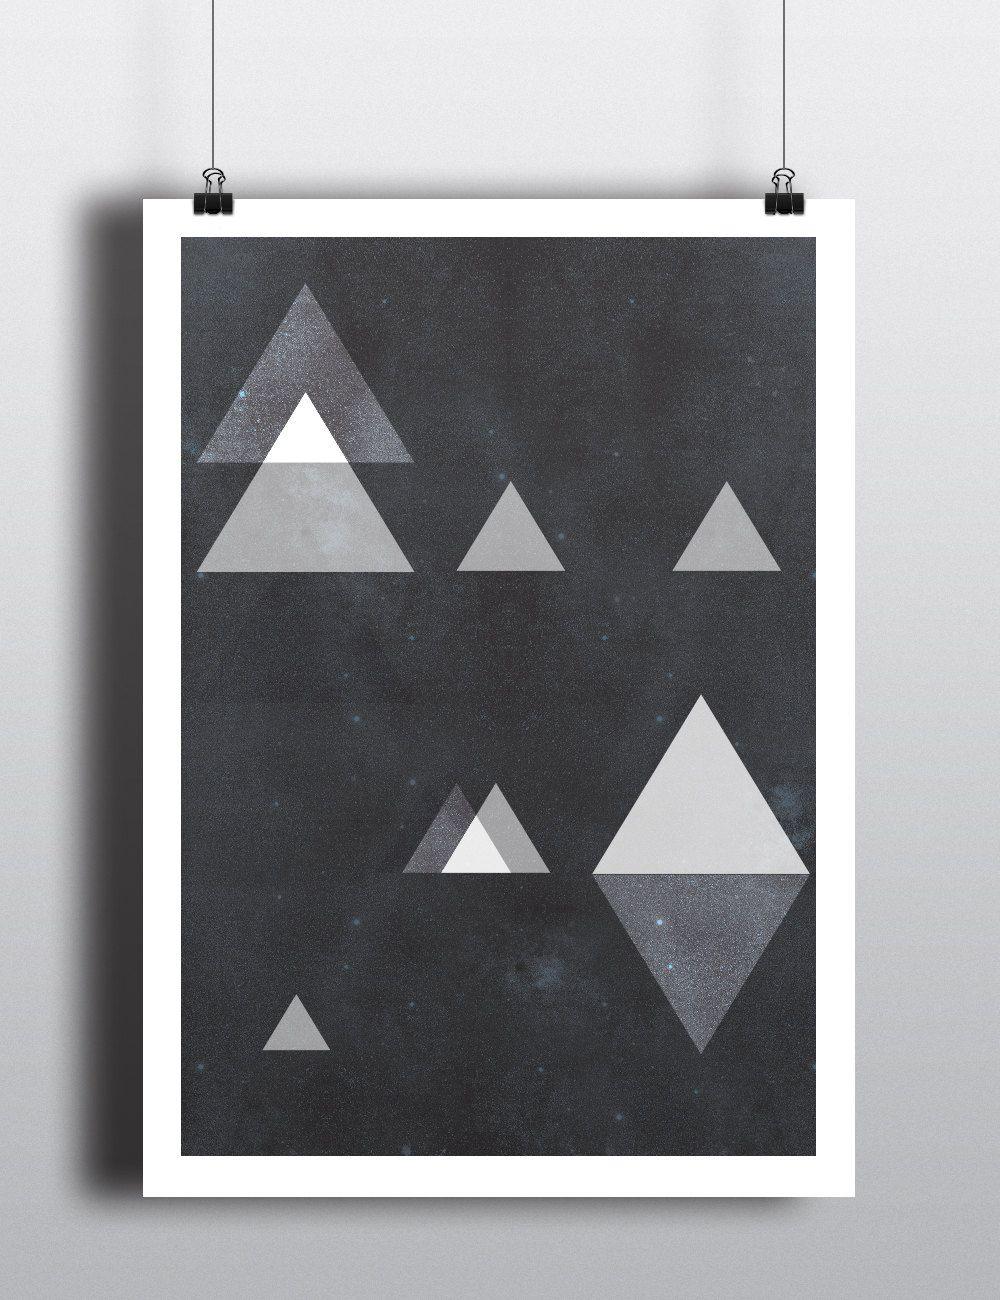 Poster design monochrome - Triangles Odyssey Poster Abstract Art 18x24 Minimalist Art Geometric Print